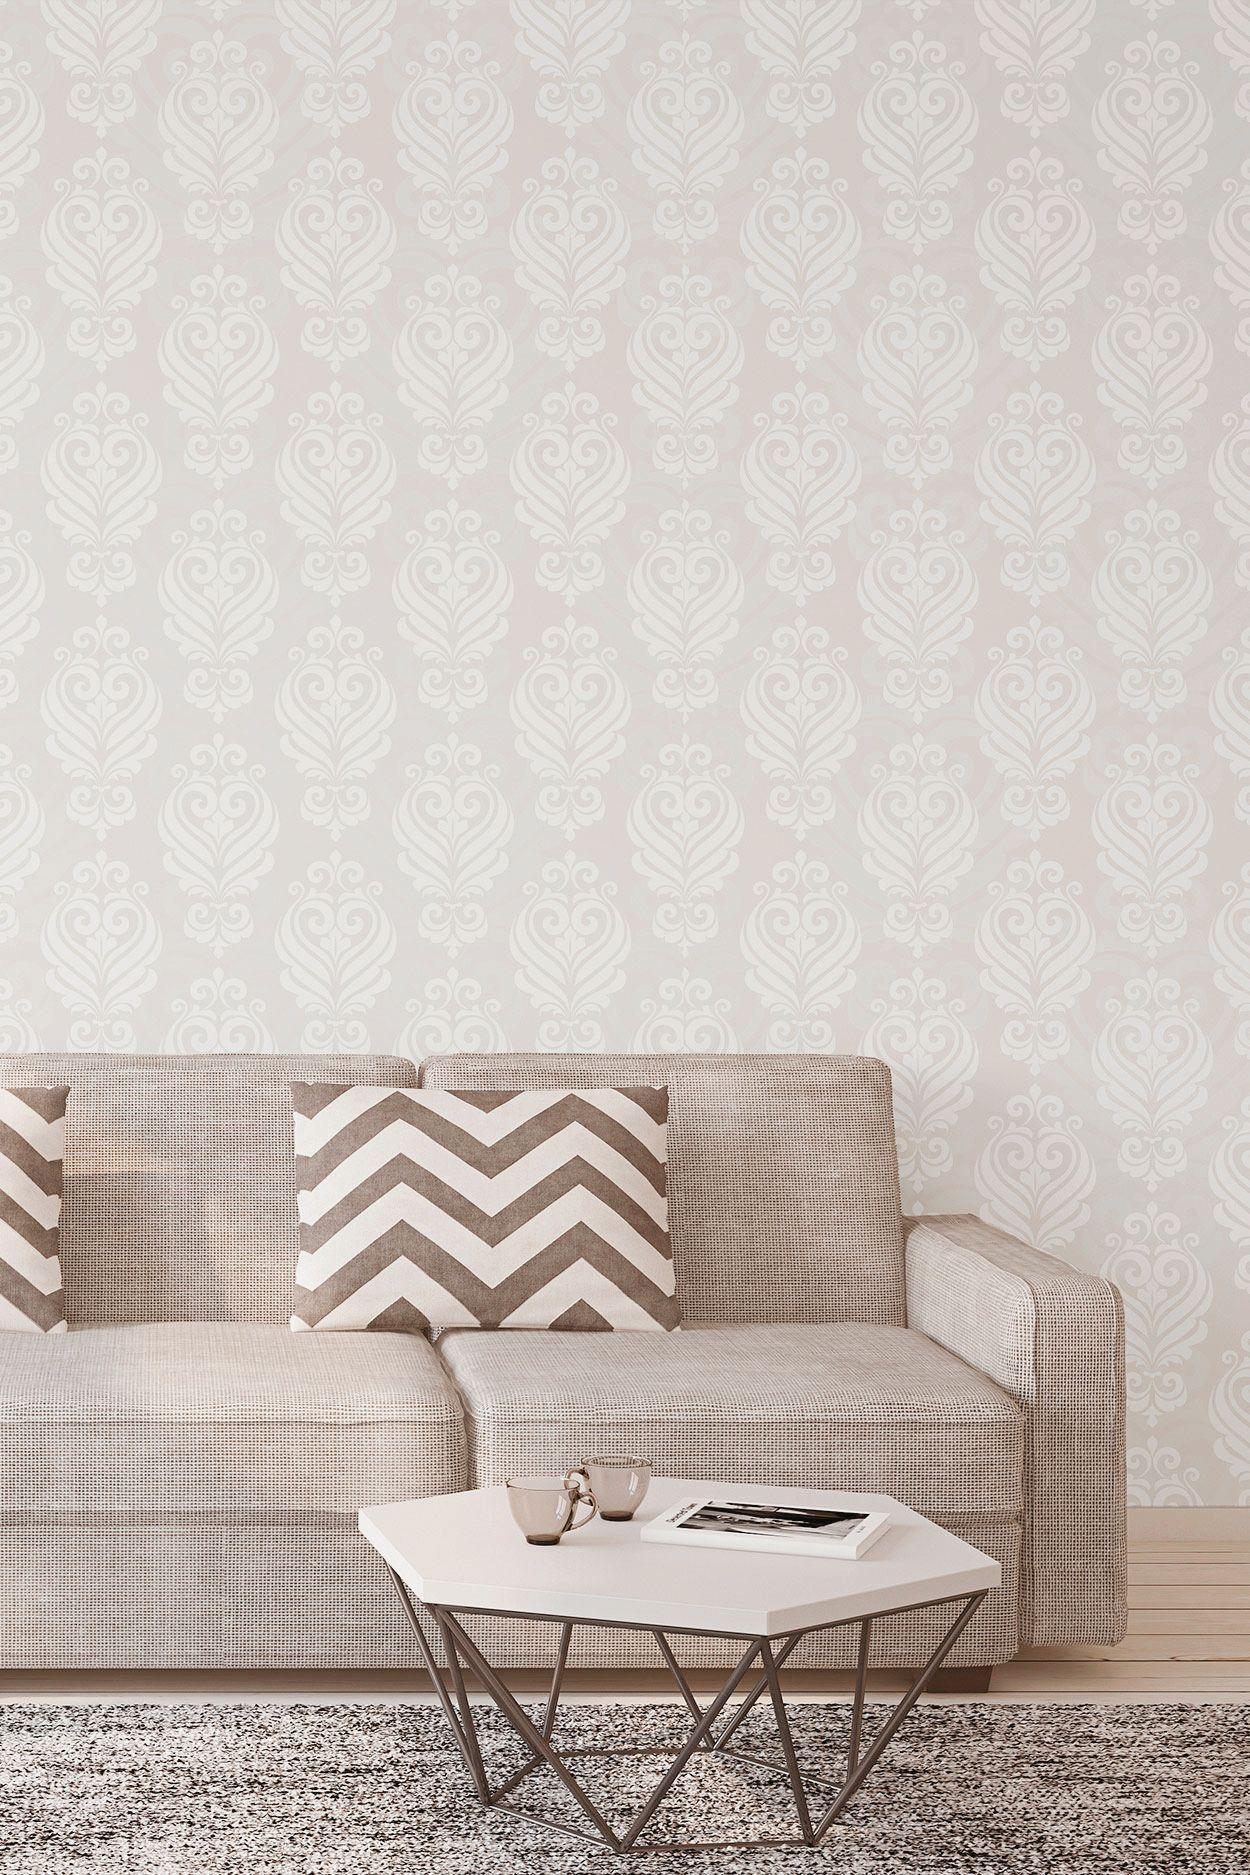 Beige Damask Basic Fabric Removable Wallpaper 4775 Living